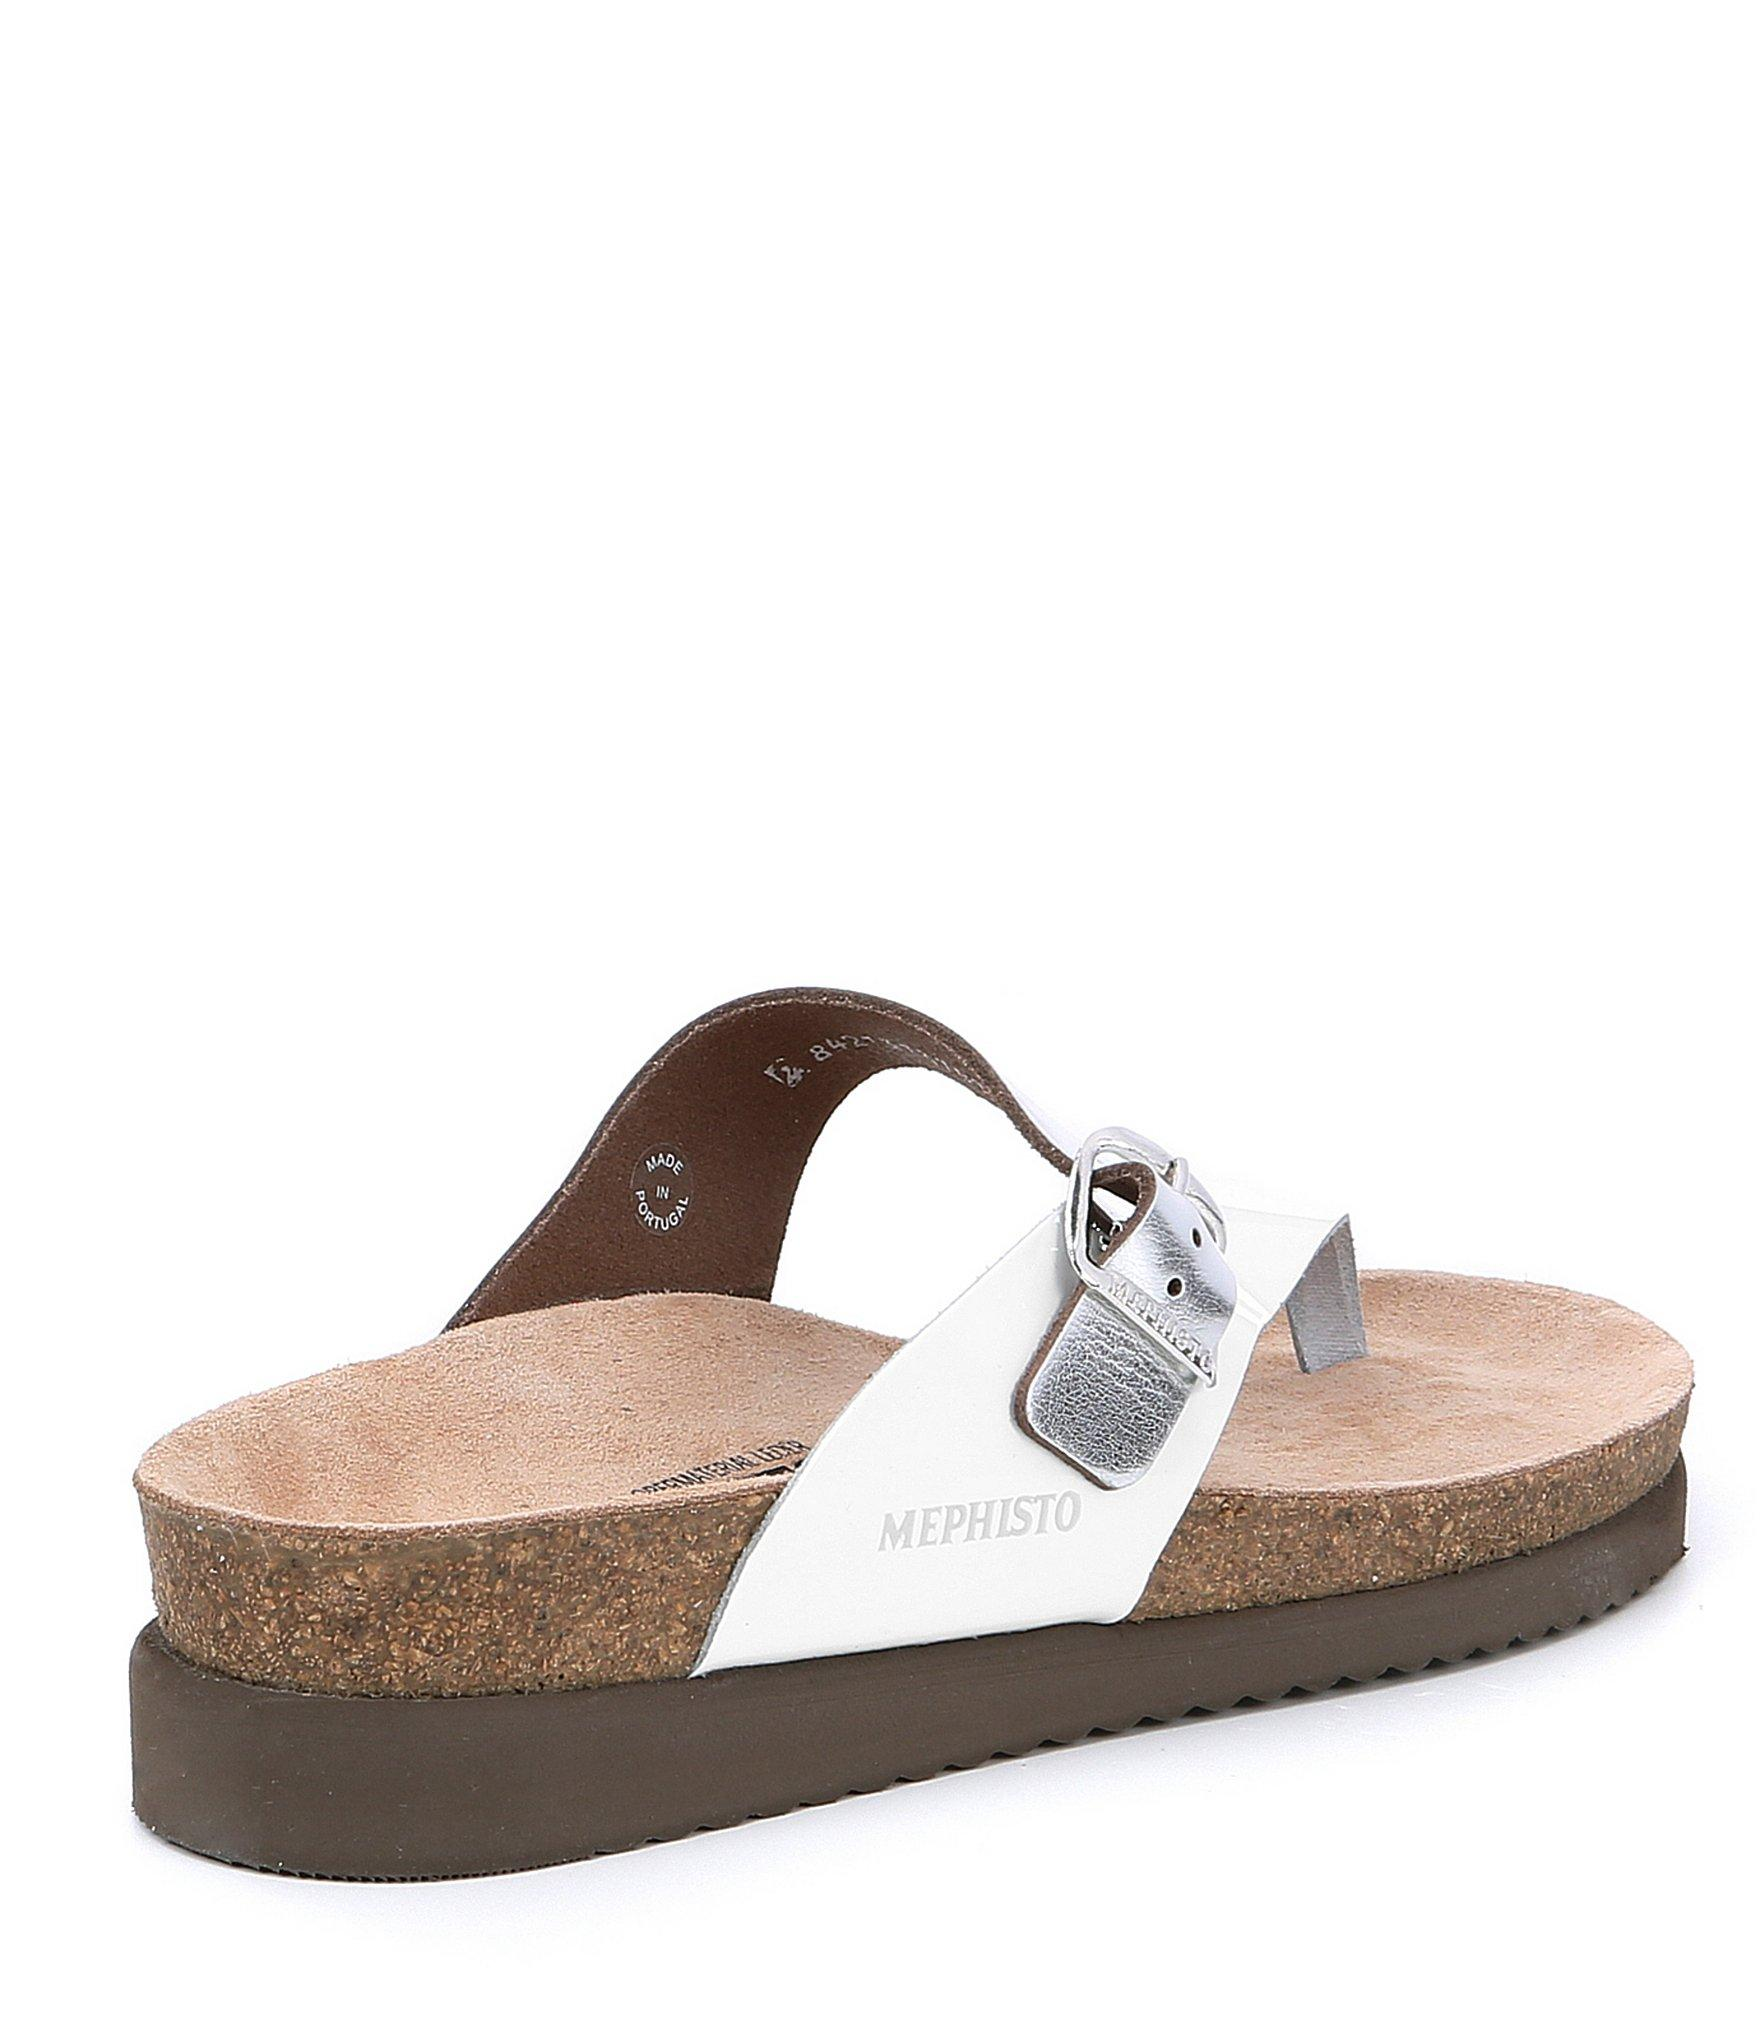 dfd9b0a8876f Mephisto - Multicolor Helen Mix Slide Thong Sandals - Lyst. View fullscreen